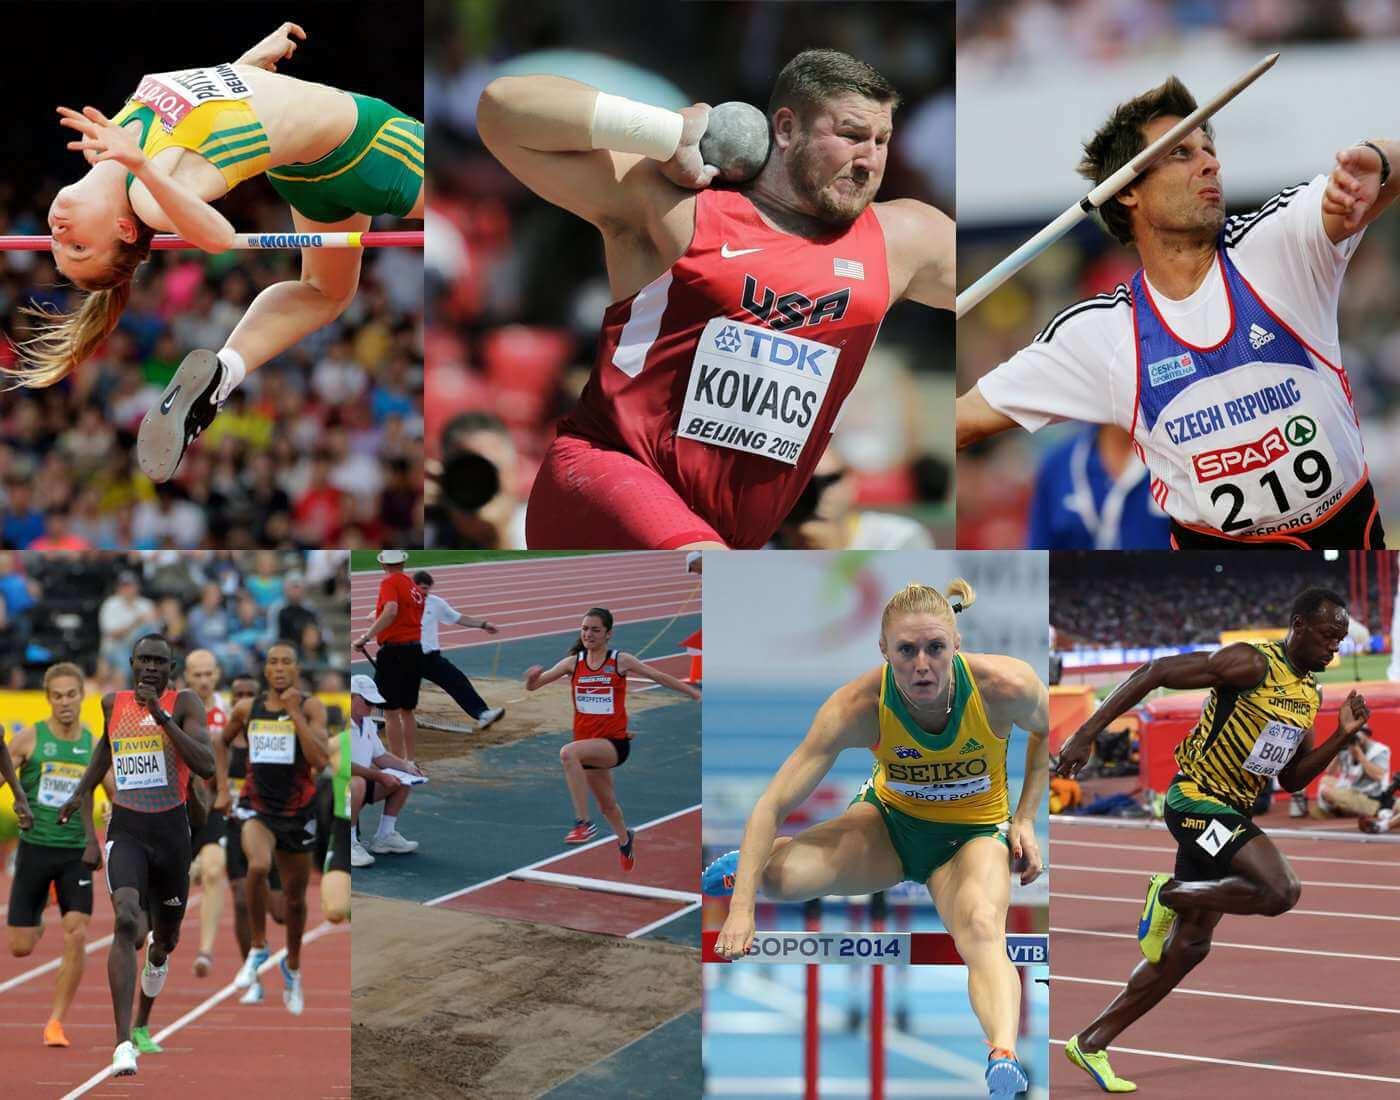 Heptathlon athletics